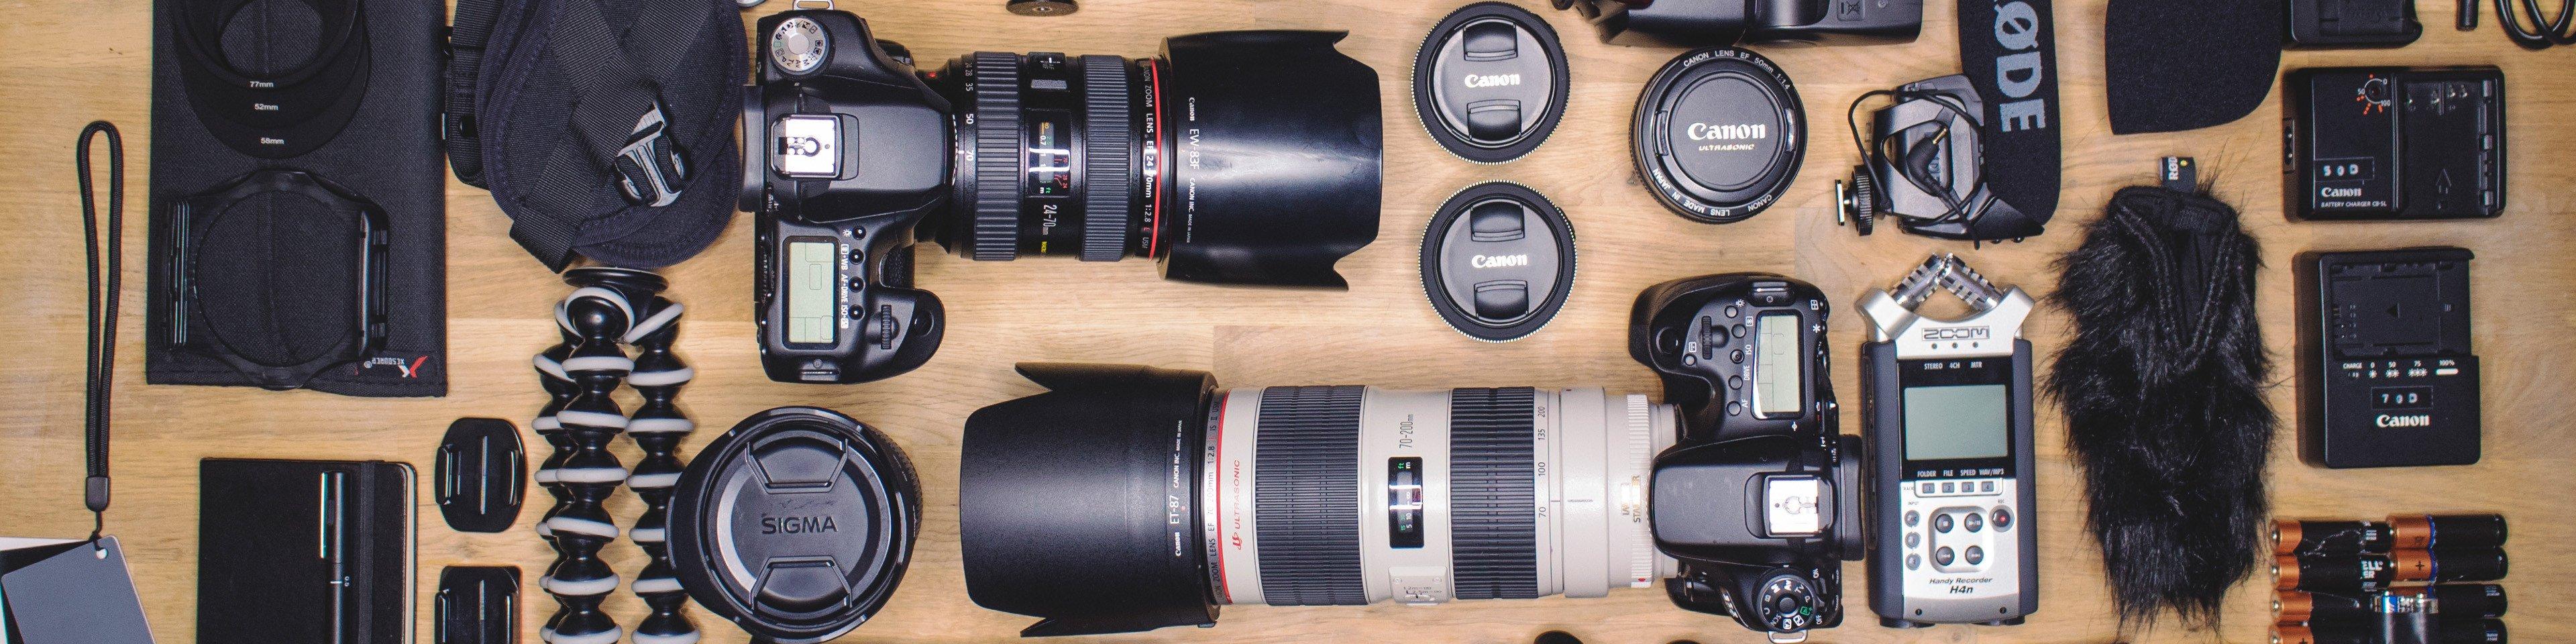 All camera equipment